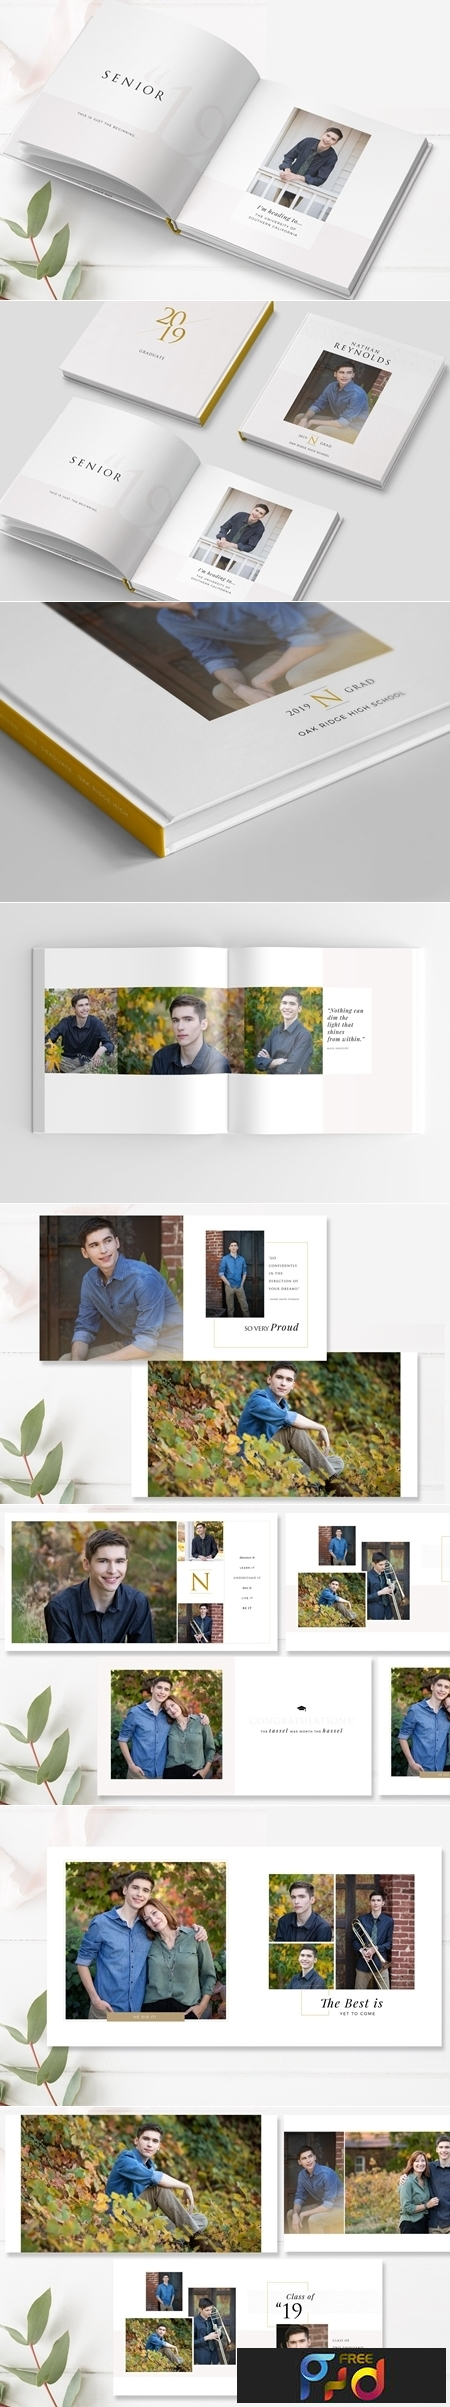 Graduation Photo Album Template 3801943 1